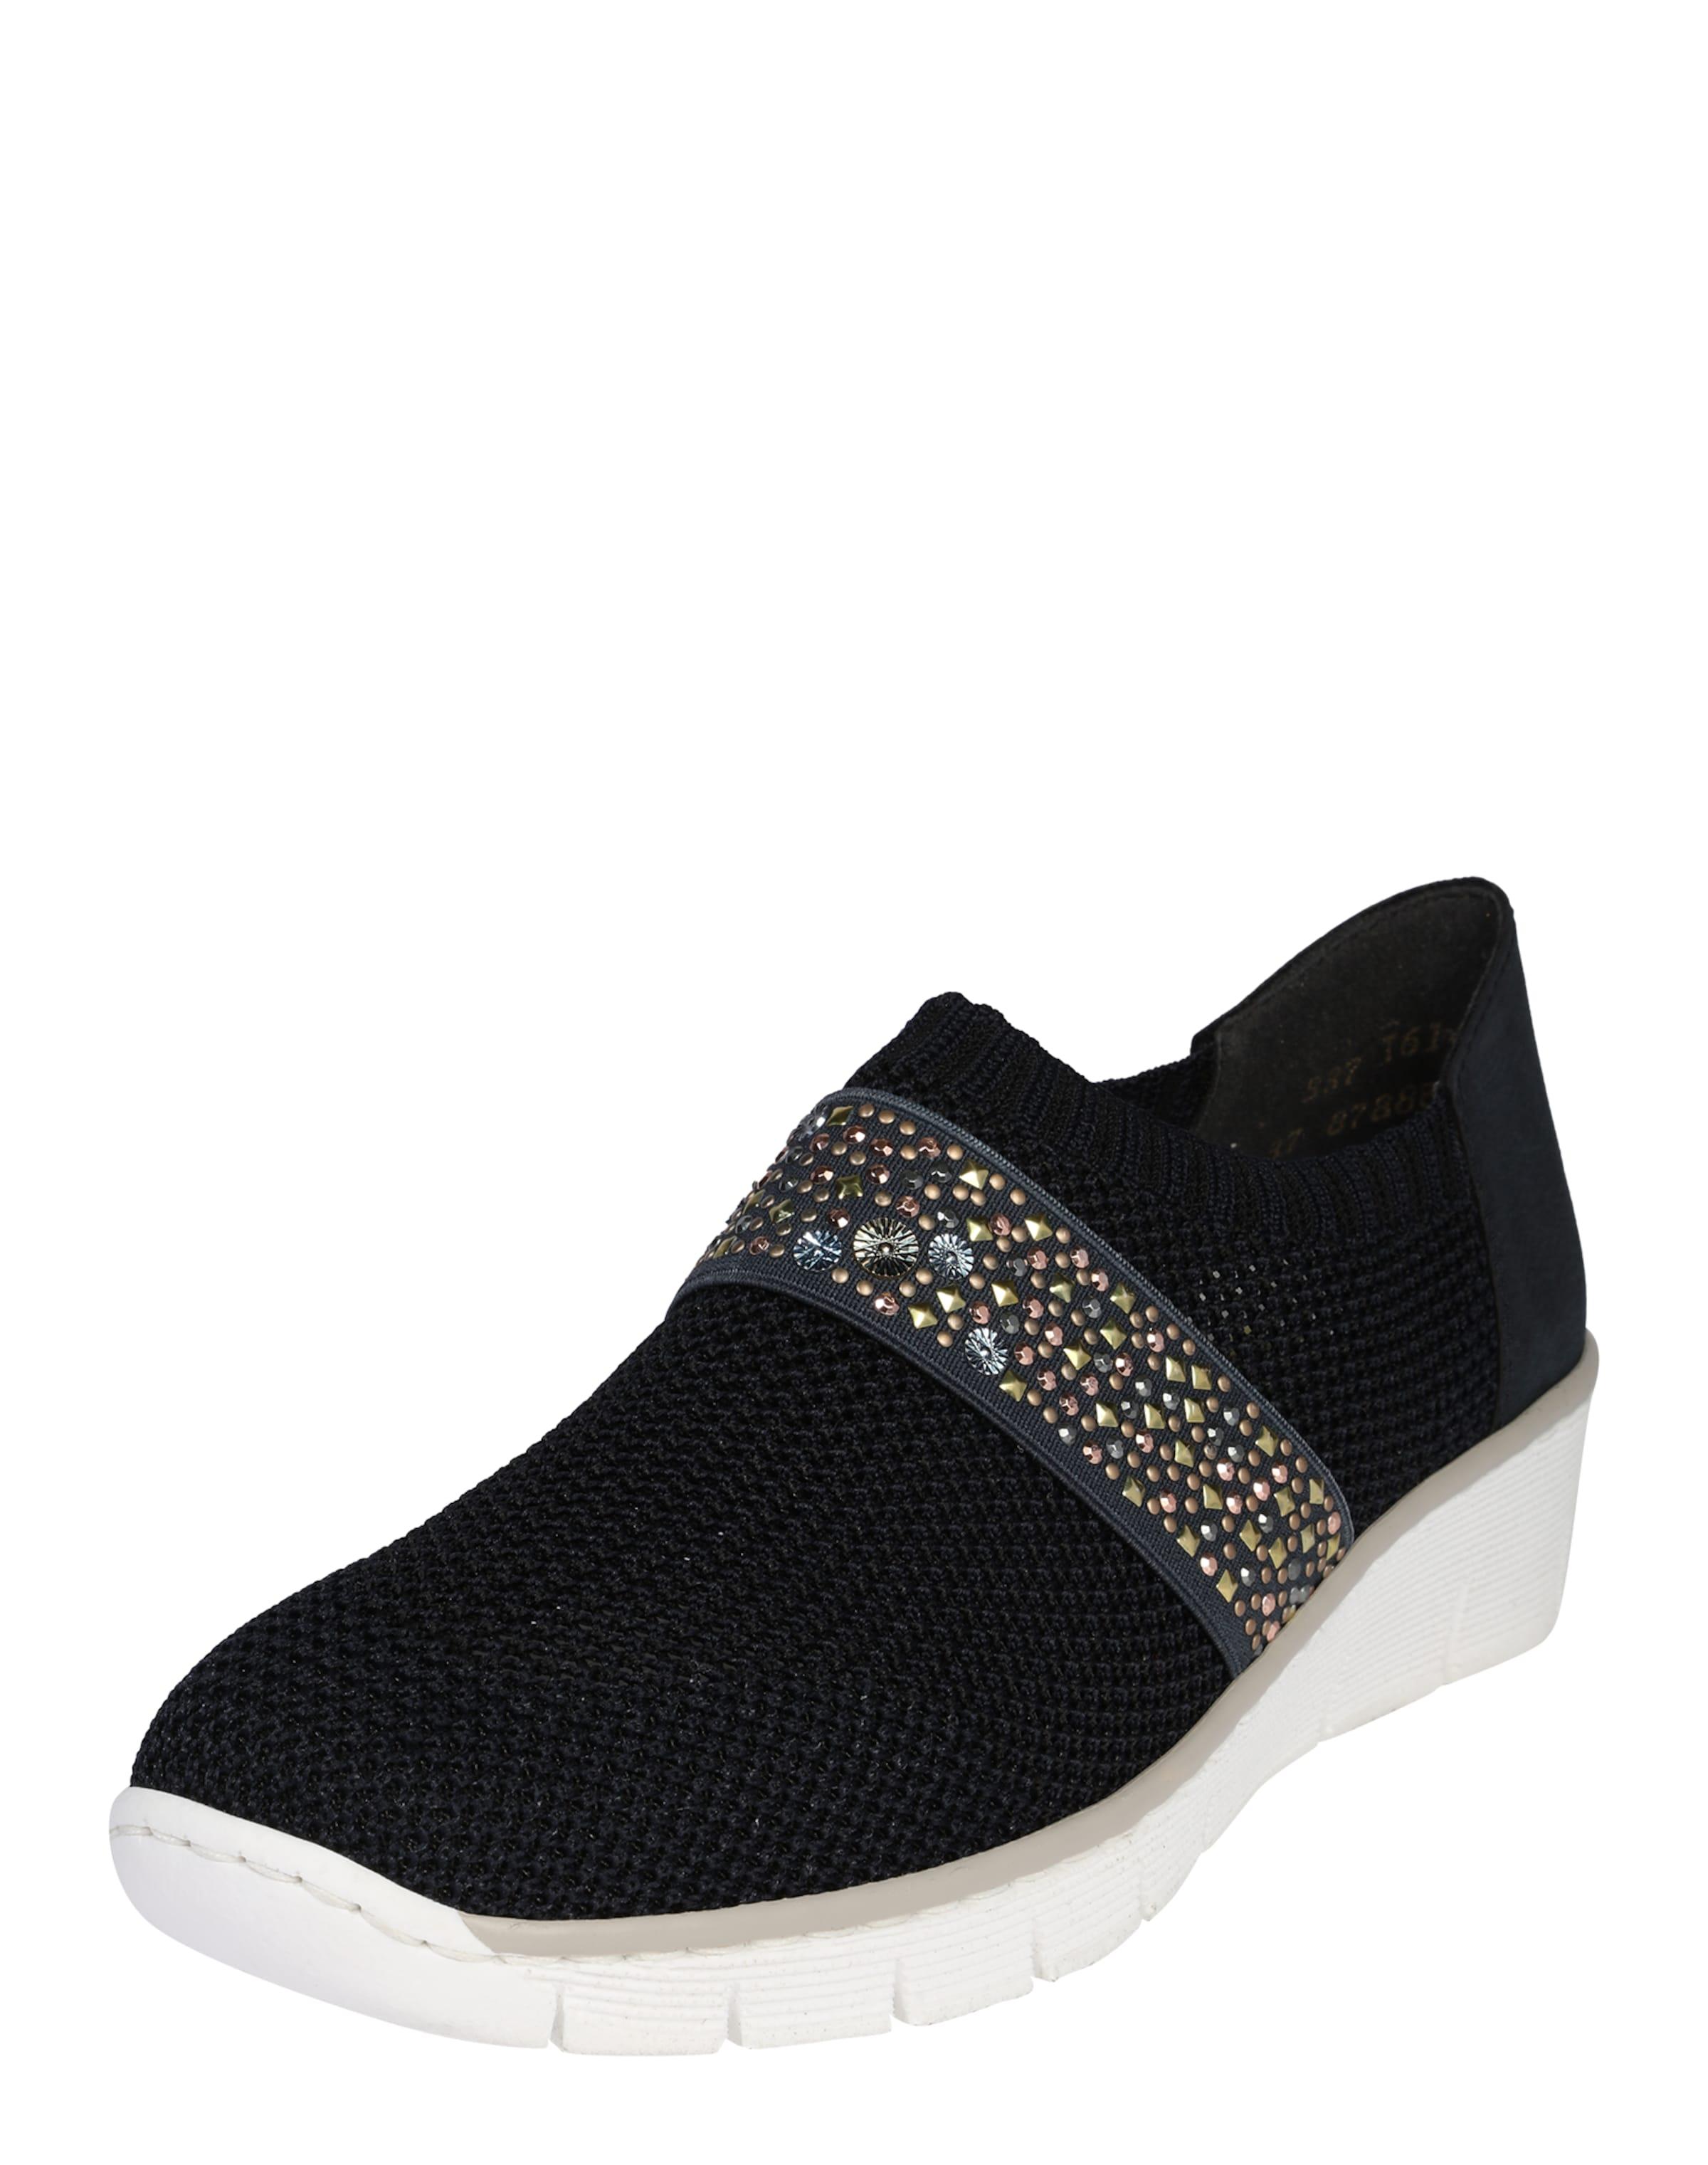 Haltbare Mode billige Schuhe RIEKER   Slipper 'Etno' Schuhe Gut getragene Schuhe